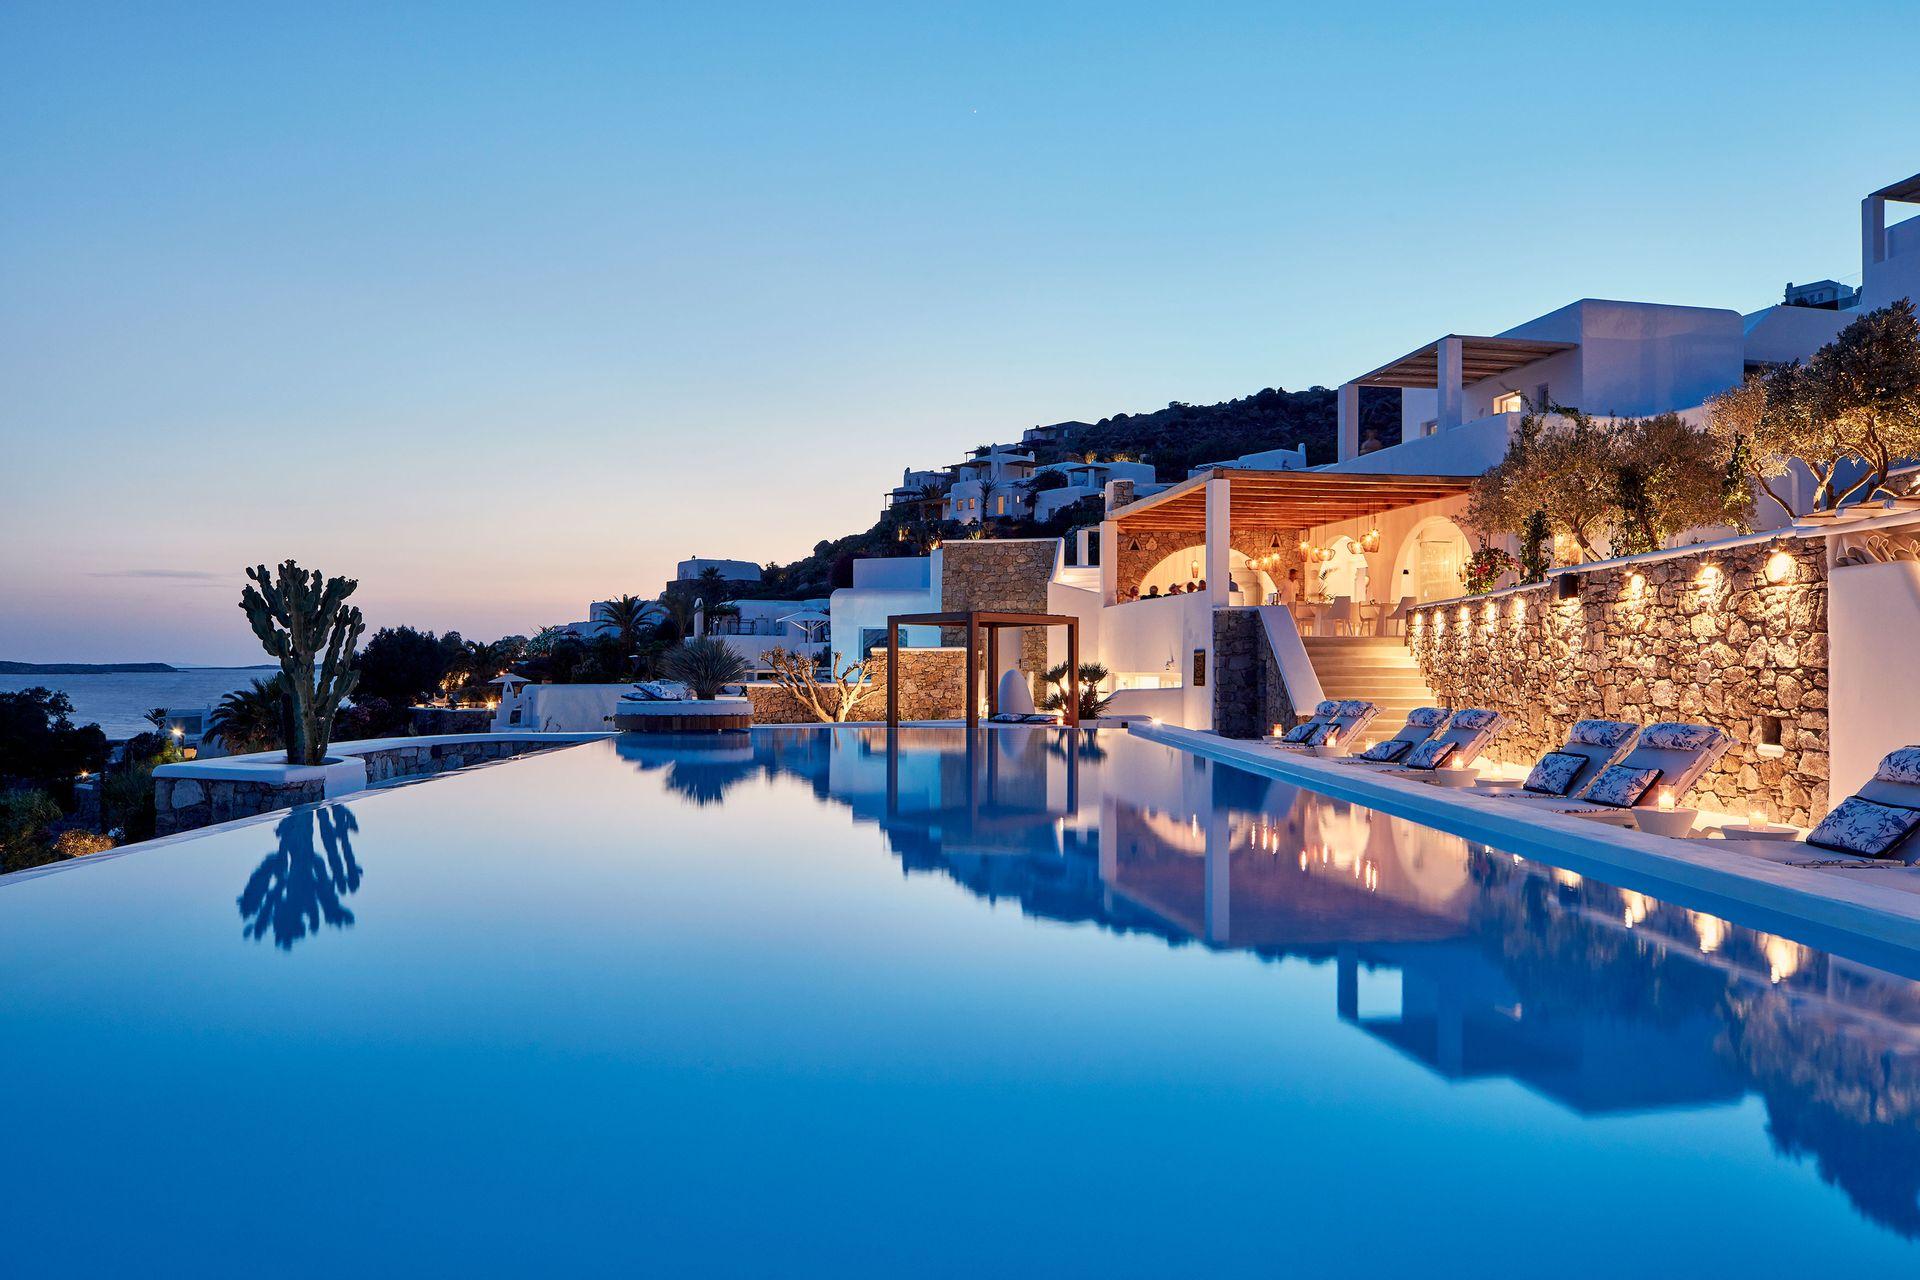 5* Katikies Mykonos, The Leading Hotels of the World - Μύκονος ✦ 2 Ημέρες (1 Διανυκτέρευση) ✦ 2 άτομα ✦ Πρωινό ✦ 30/08/2020 έως 12/09/2020 ✦ Υπέροχη Τοποθεσία!